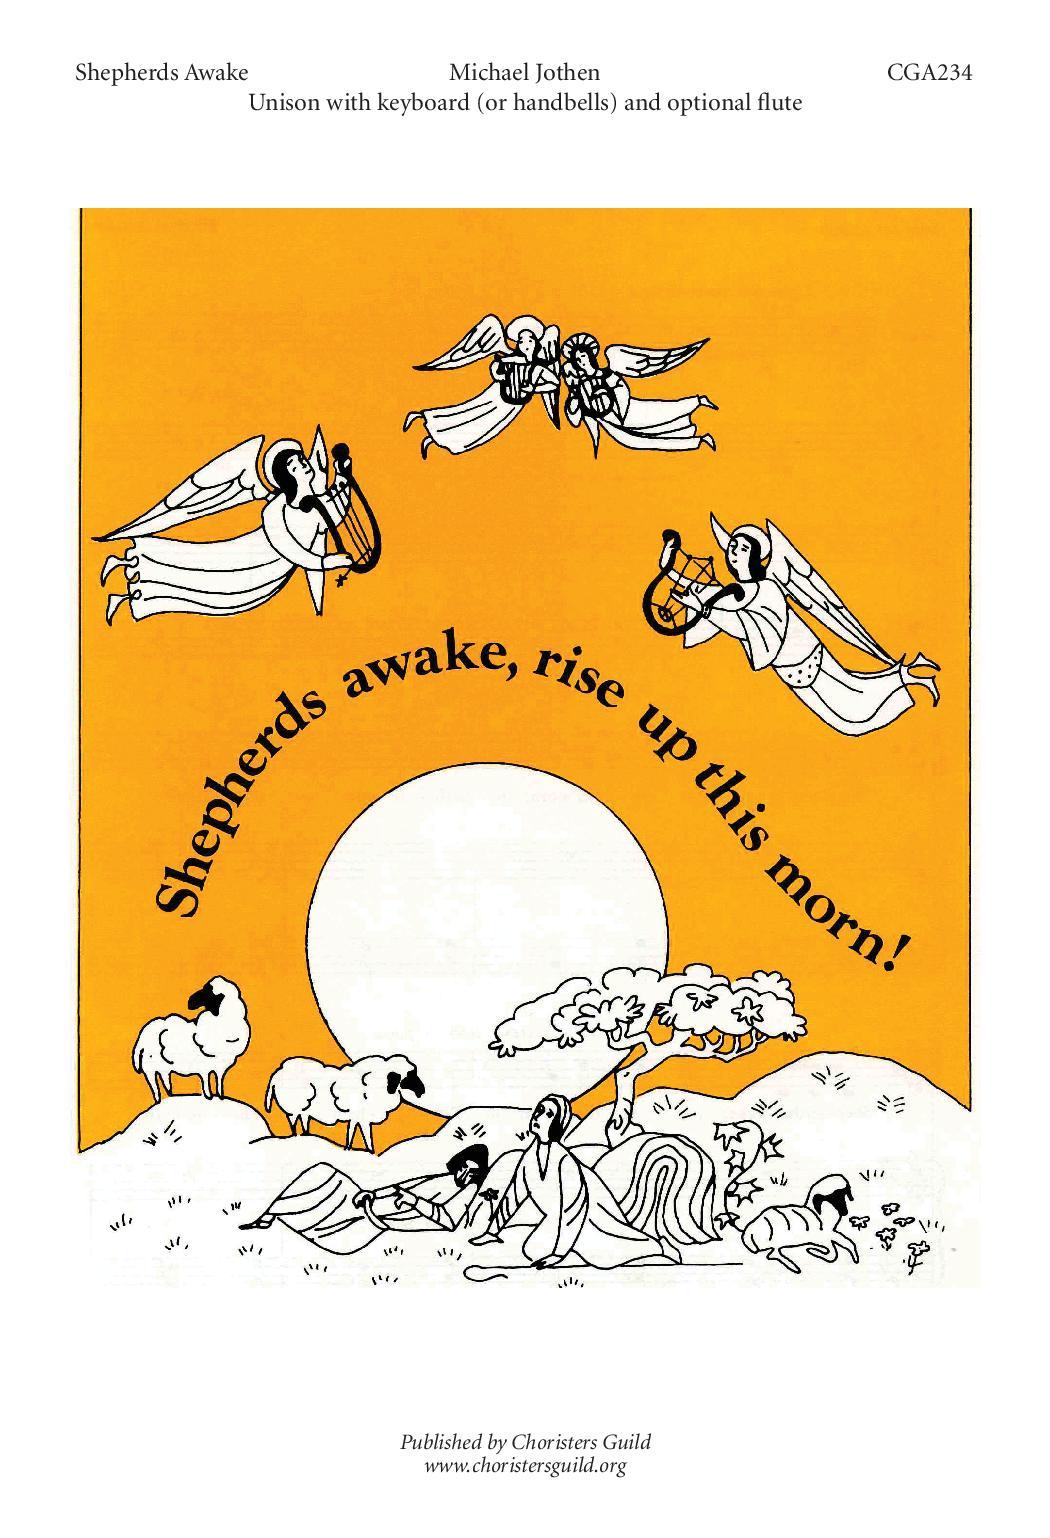 Shepherds, Awake